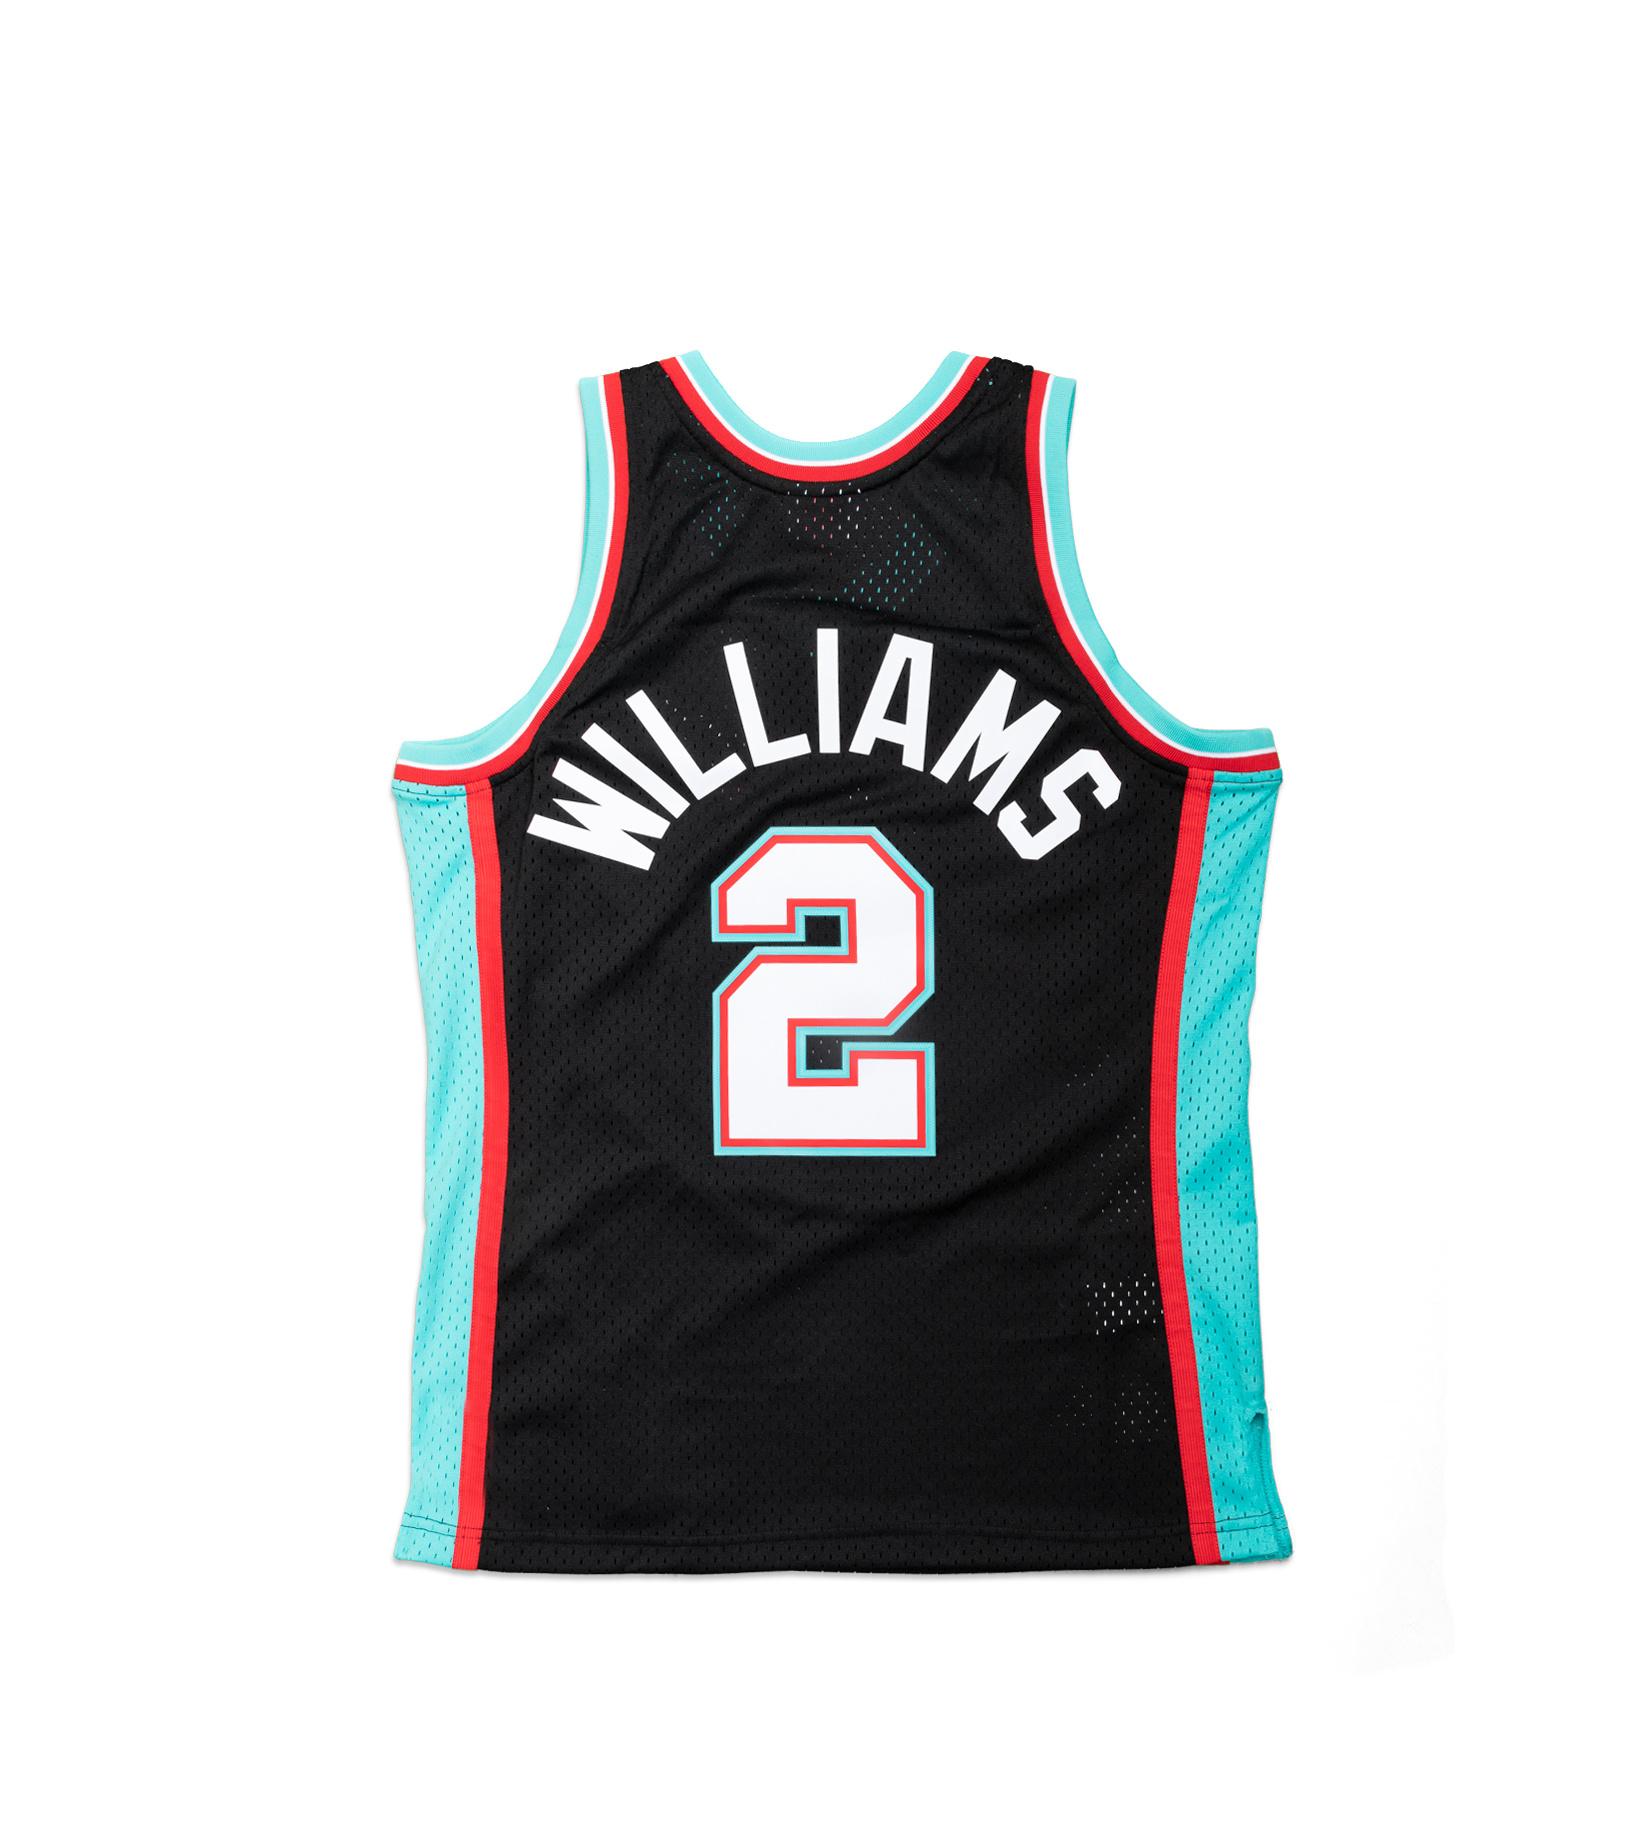 "Memphis Grizzlies '01-'02 J. Williams Swingman Jersey ""Black/Teal""-4"